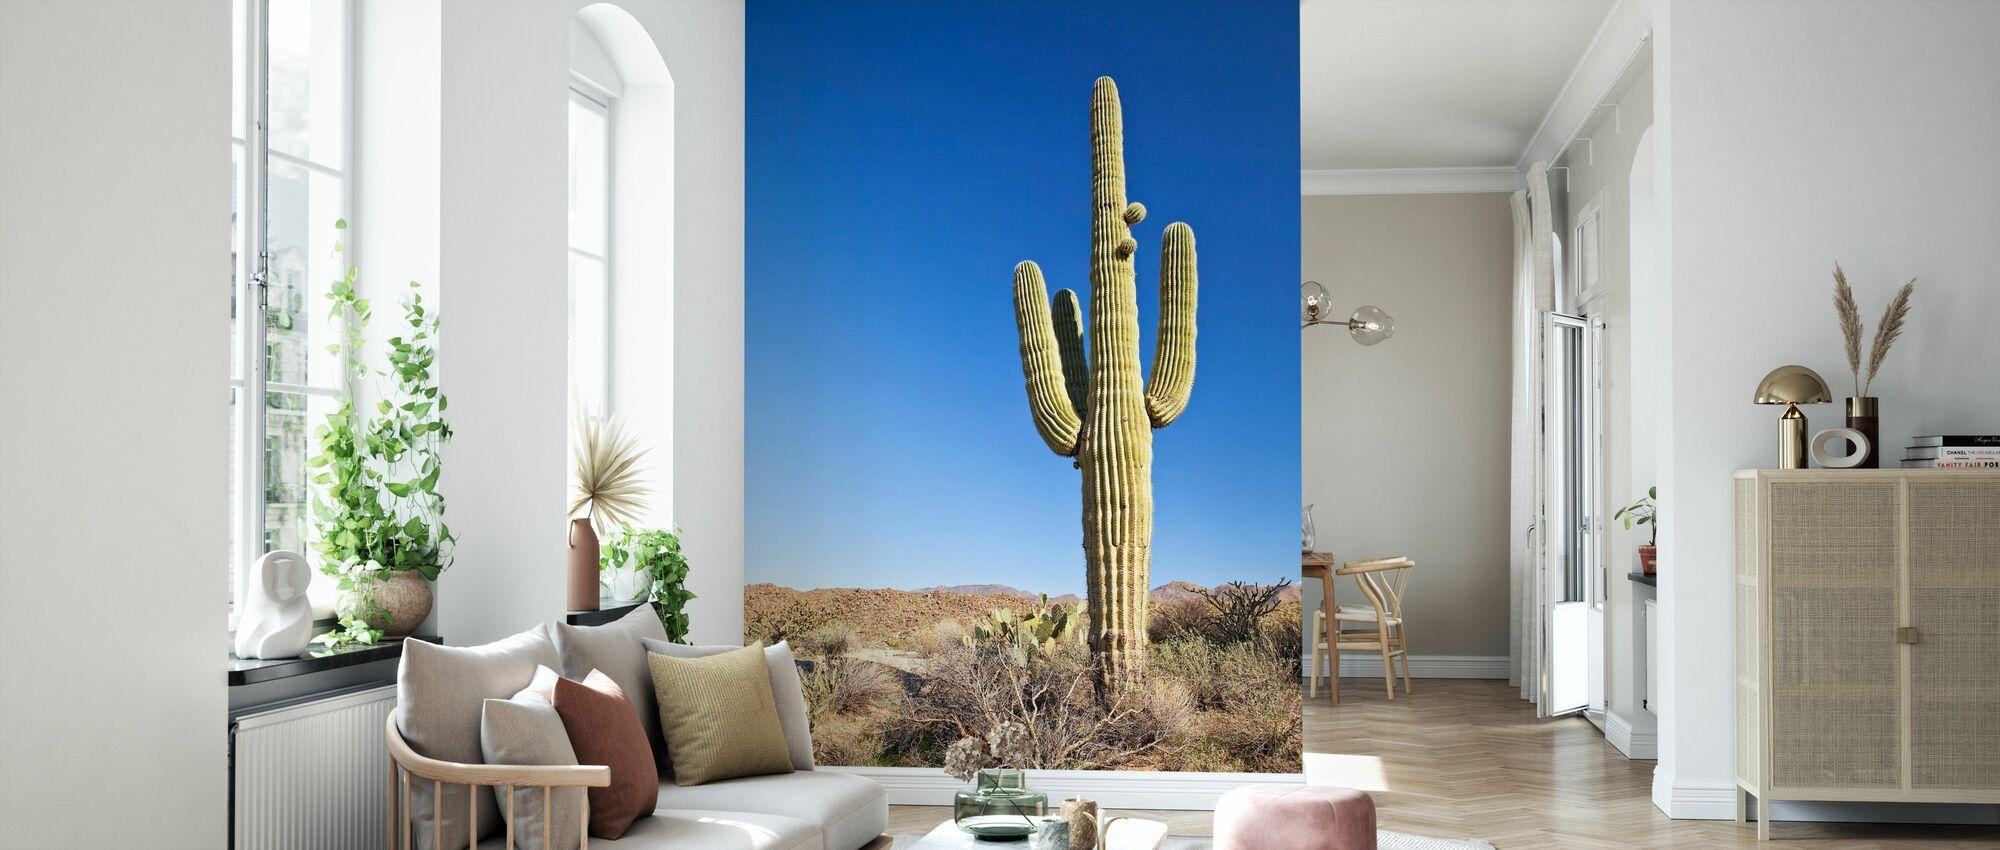 Saguaro Kaktus i ørkenen - Tapet - Stue